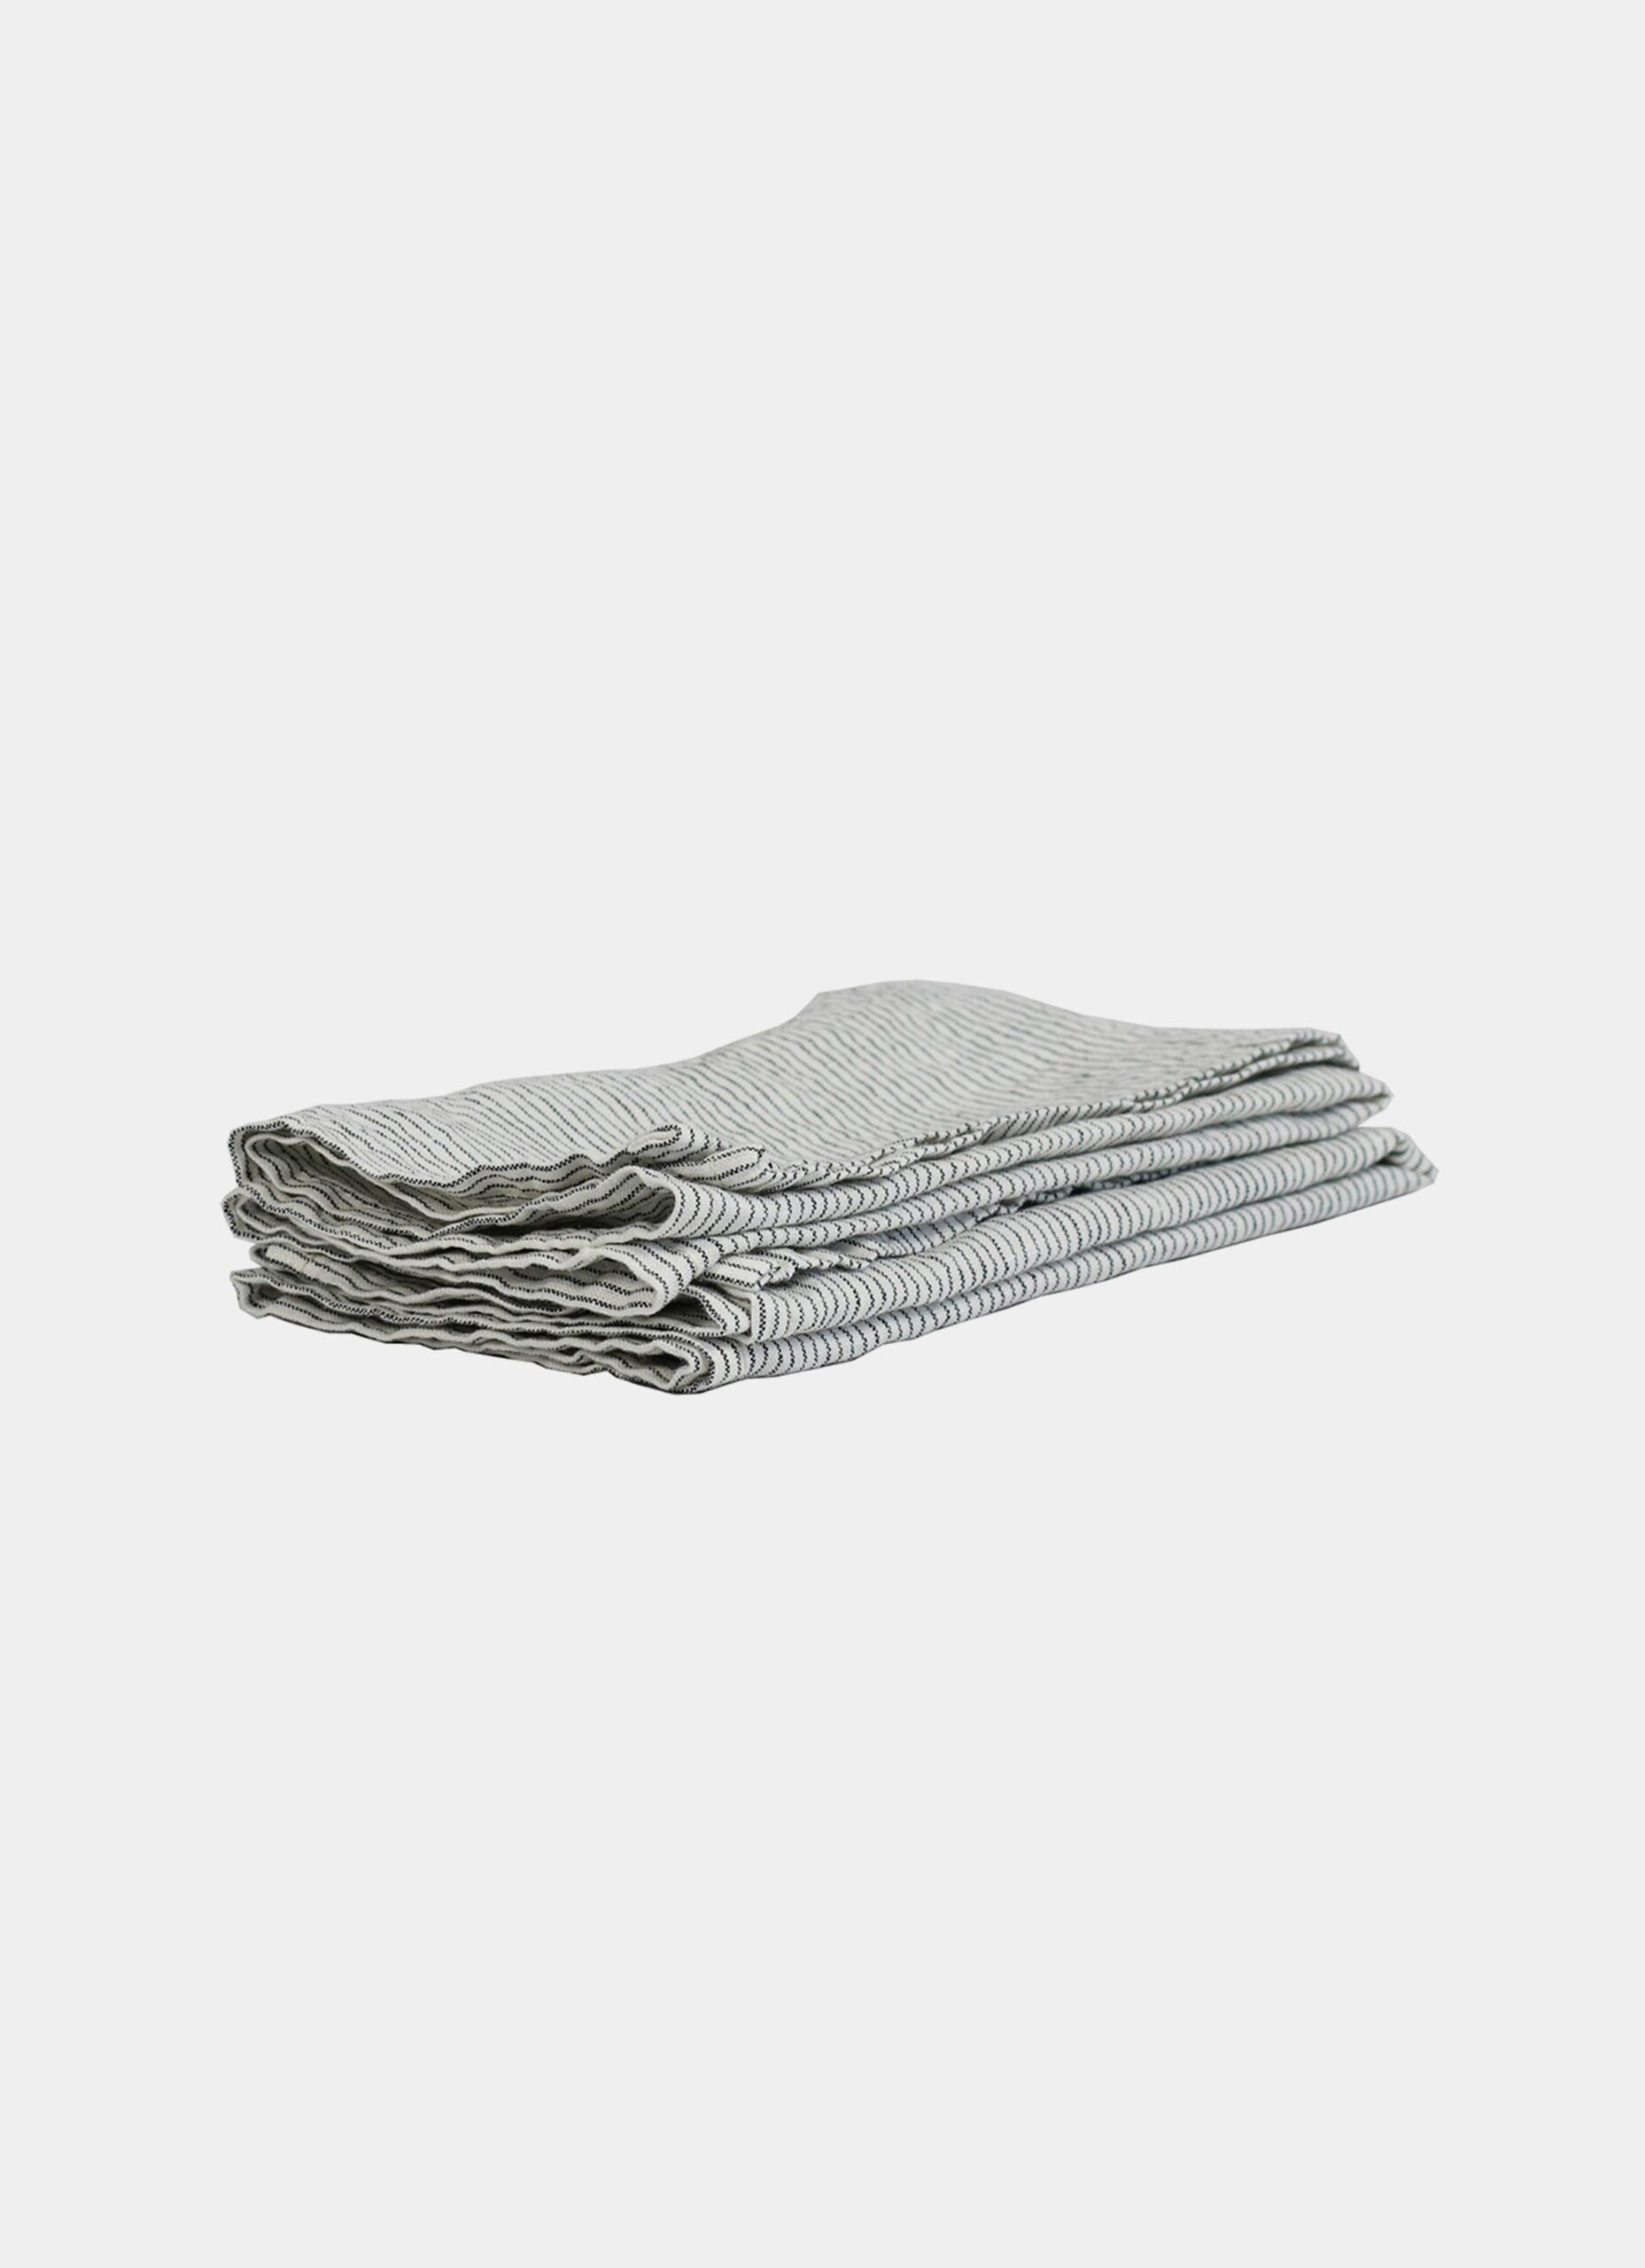 Tell me more - Kitchen Towel - Linen - Pinstripe